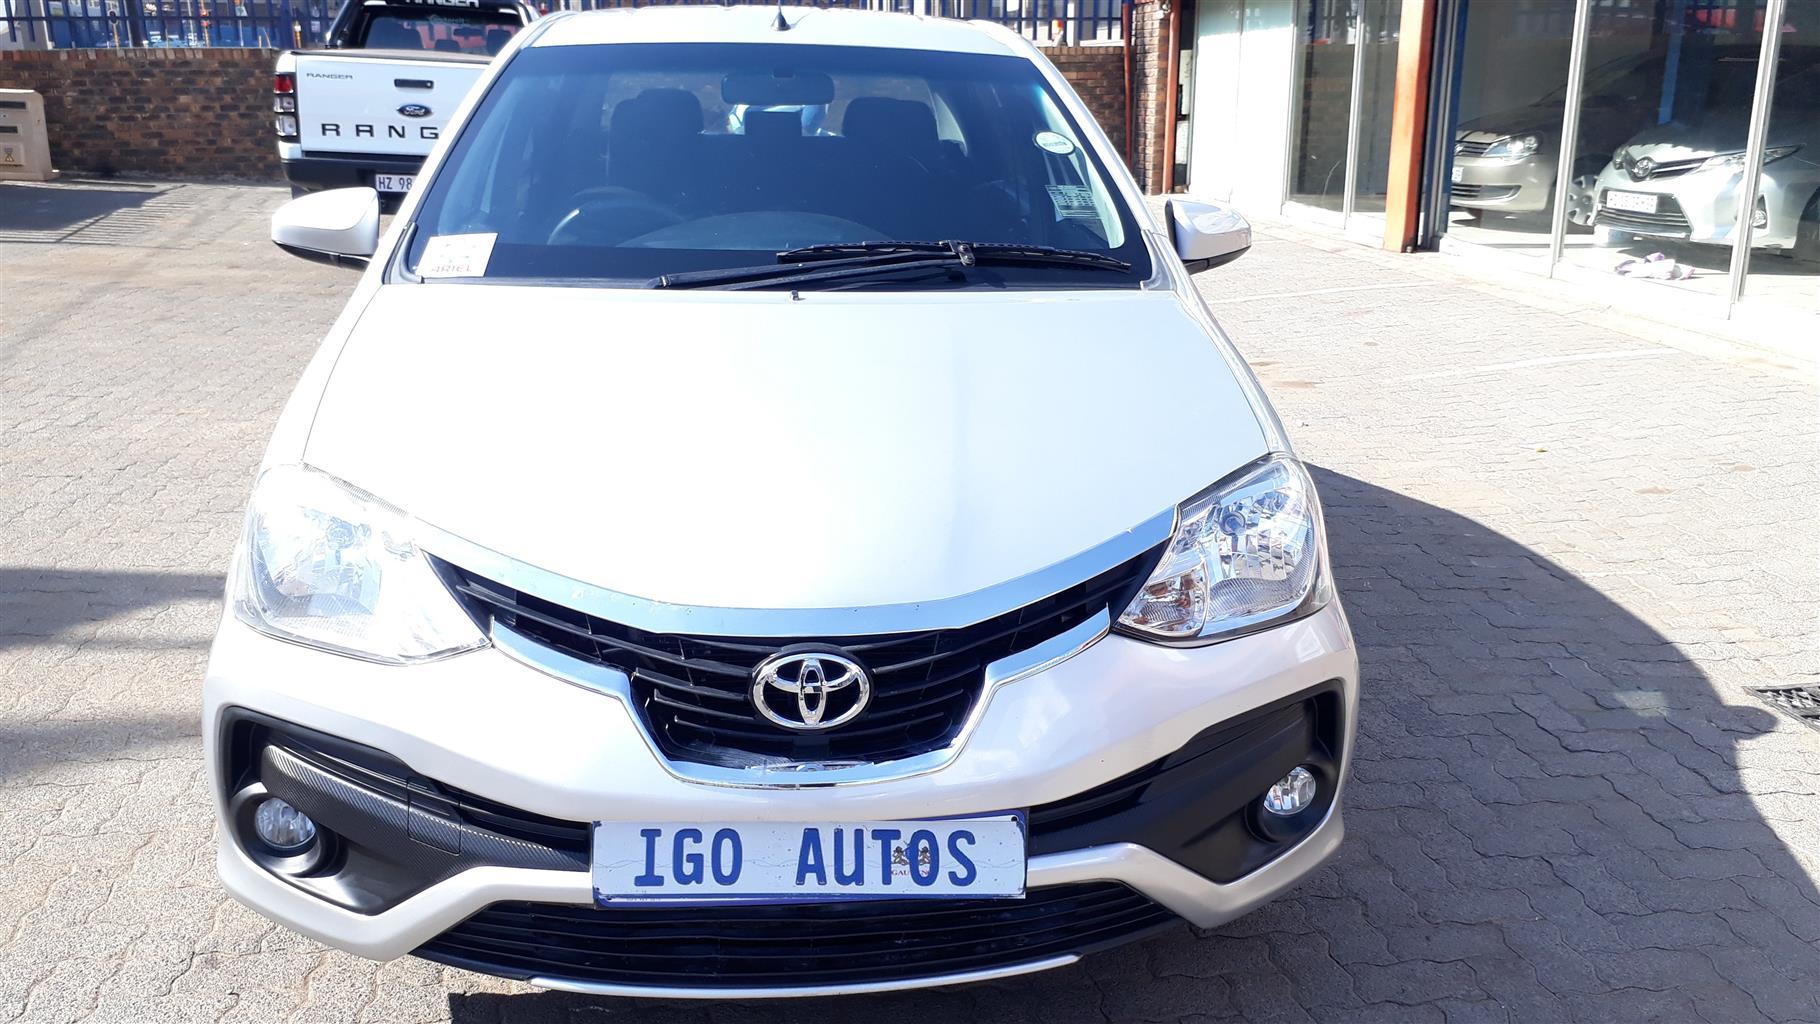 2017 Toyota Etios sedan ETIOS 1.5 Xs/SPRINT | Junk Mail